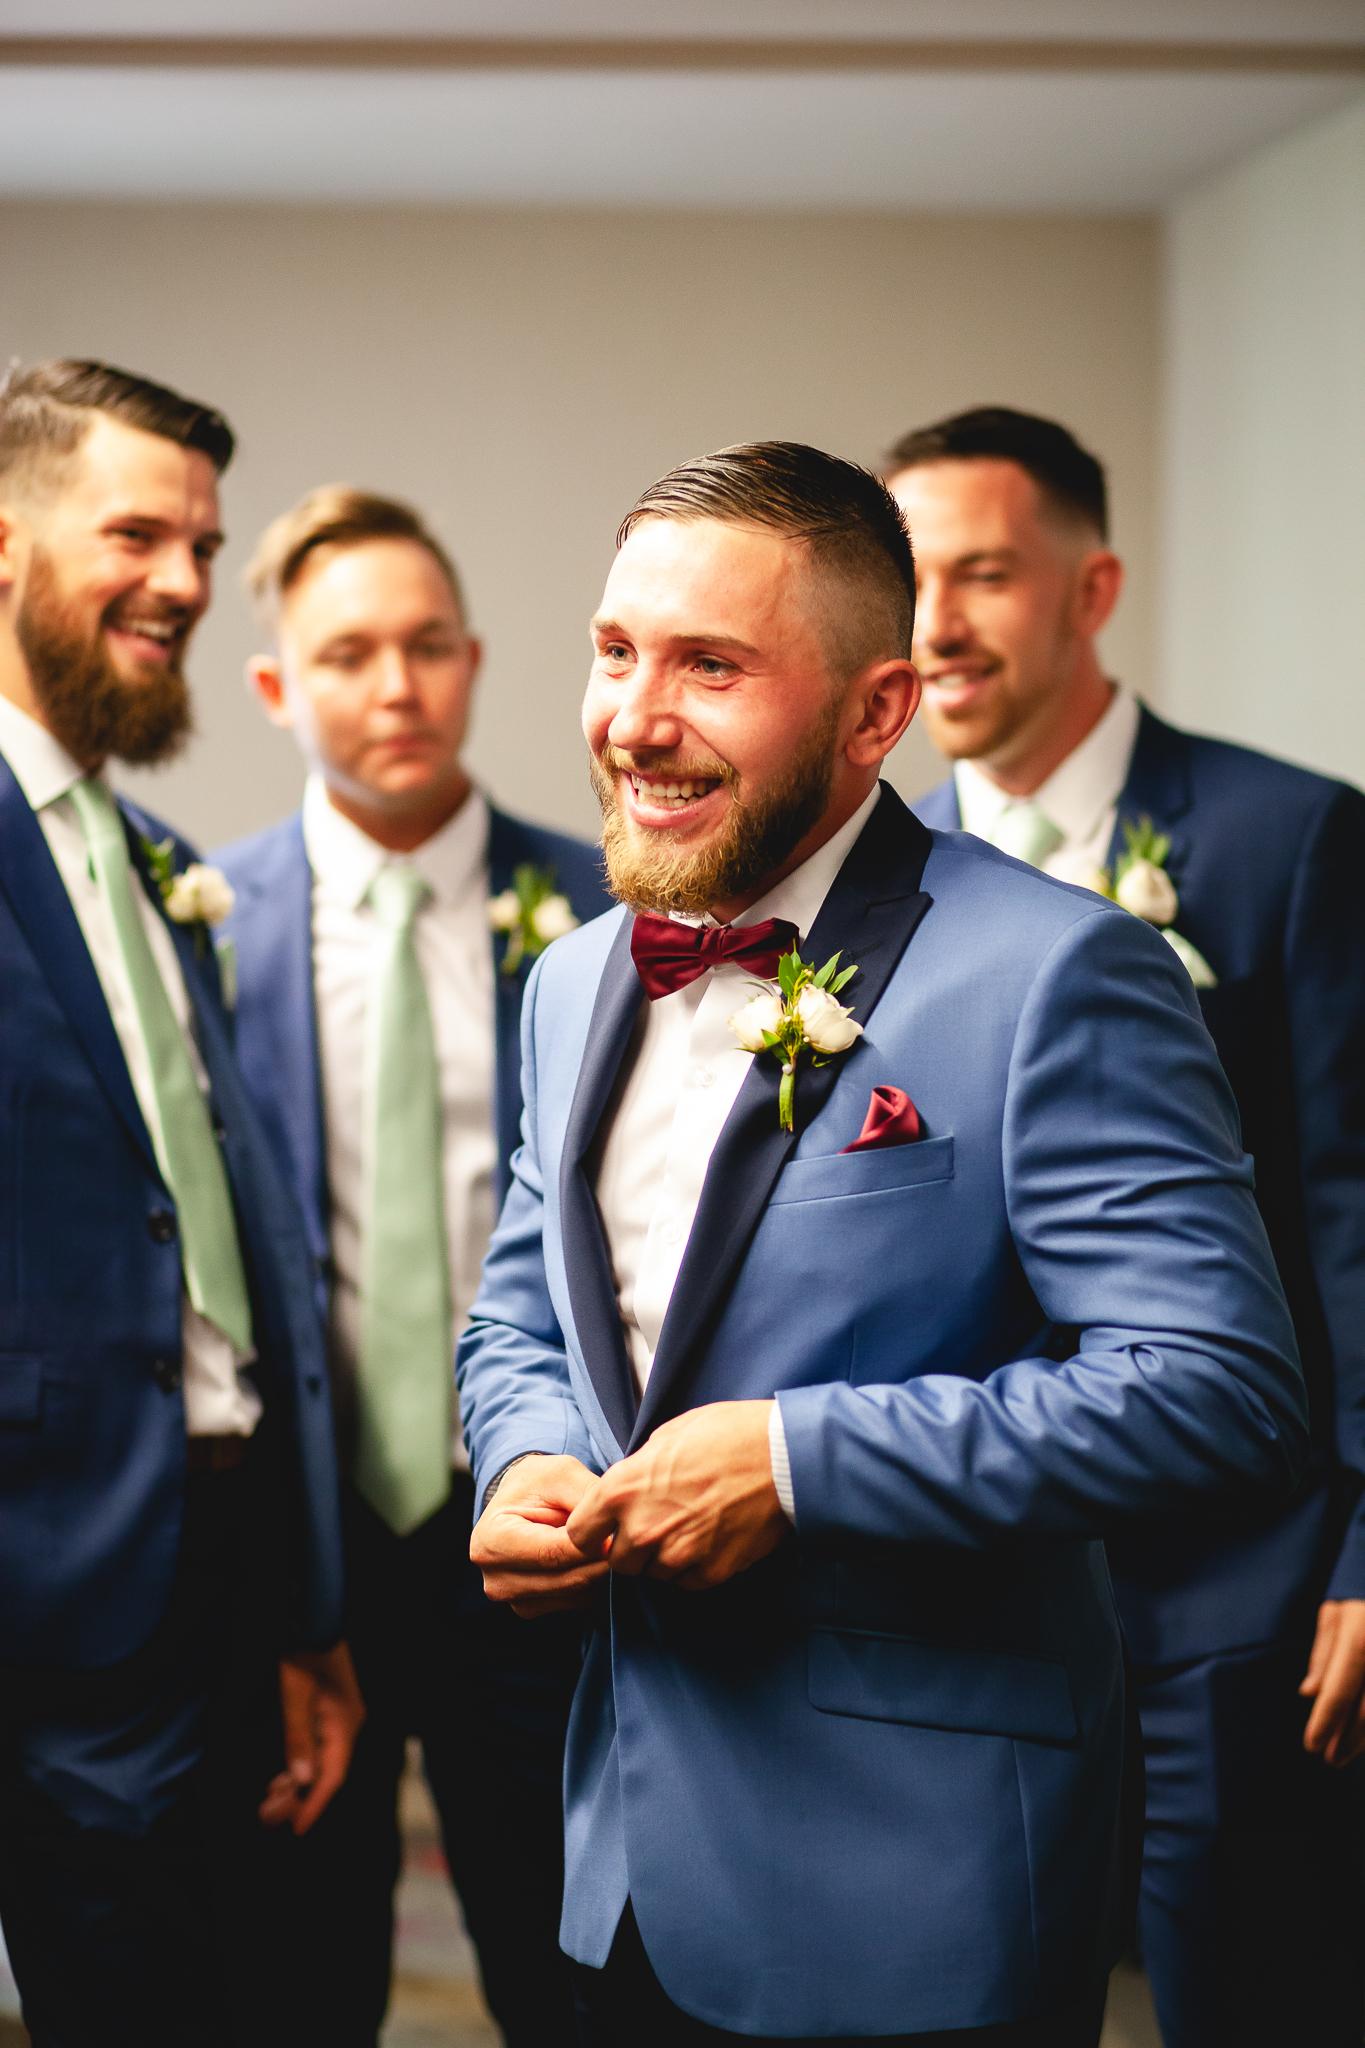 Amy D Photography- Barrie Wedding Photography- Wedding Getting Ready- Bride getting ready- Muskoka Wedding Photography-32.jpg